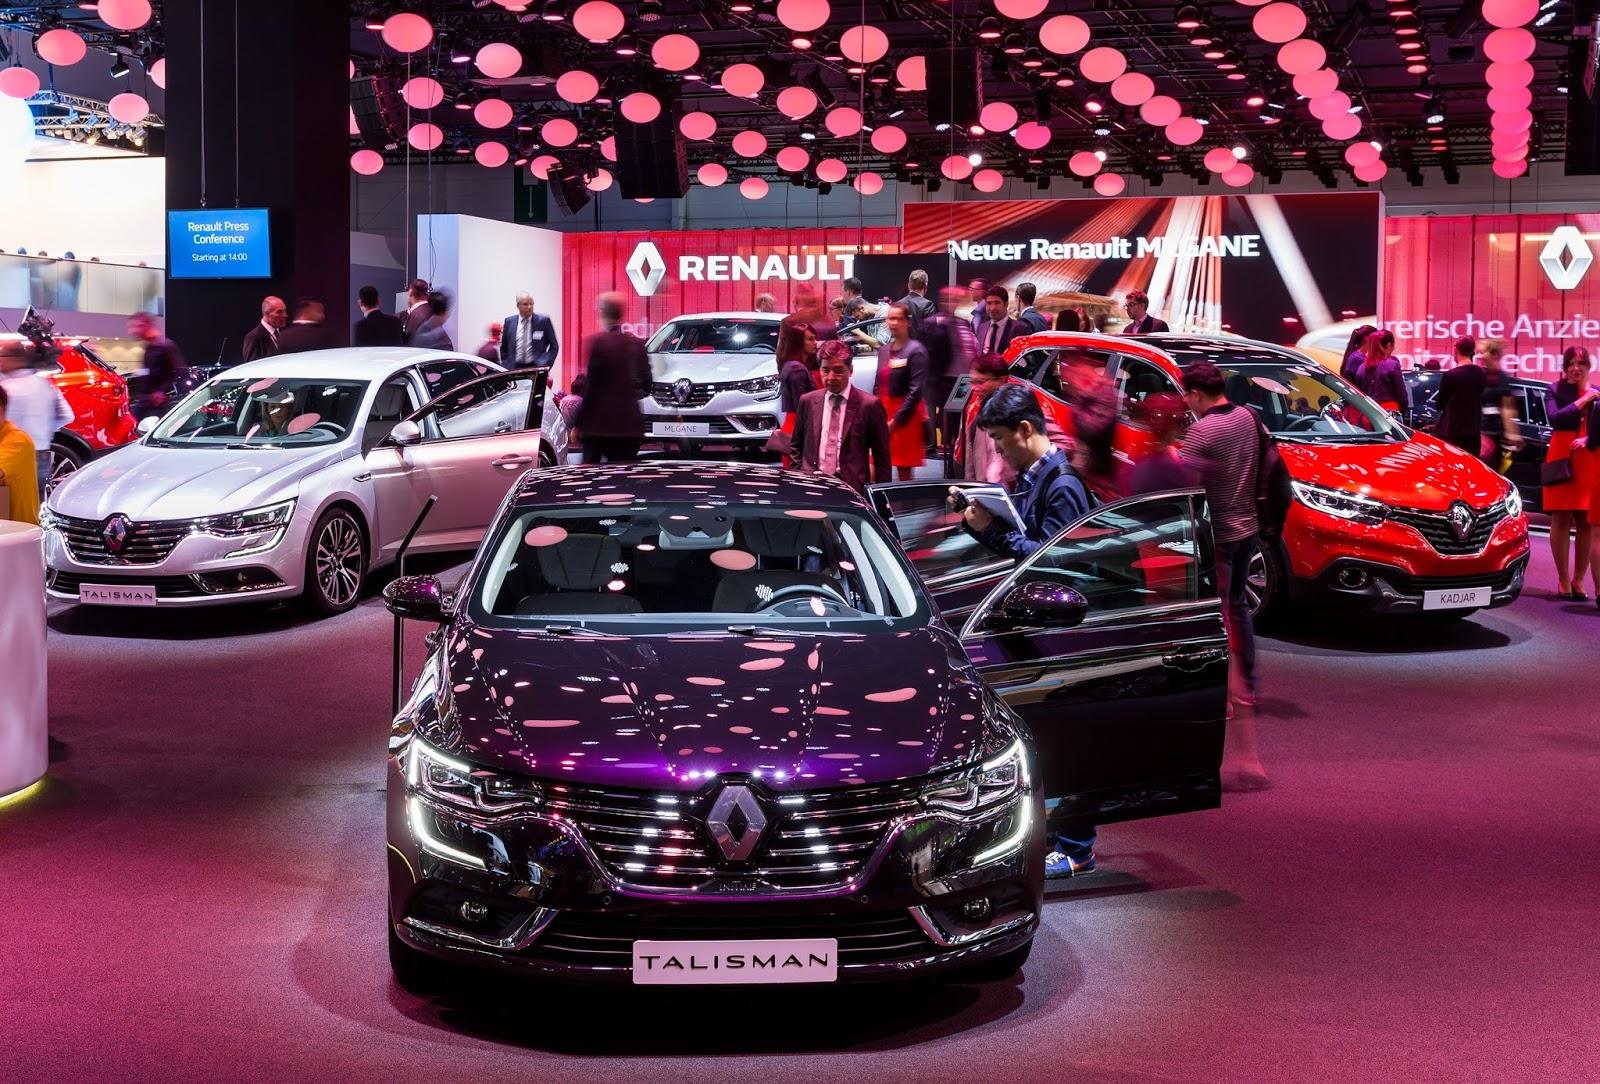 New Renault TALISMAN ESTATE Το νέο Renault Mégane παρουσιάστηκε στην διεθνή έκθεση της Φρανκφούρτης με έκδοση GT και 205 ίππους Renault, Renault Megane, Renault Talisman, Renault Talisman Estate, ΣΑΛΟΝΙ ΑΥΤΟΚΙΝΗΤΟΥΦΡΑΝΚΦΟΥΡΤΗΣ 2015